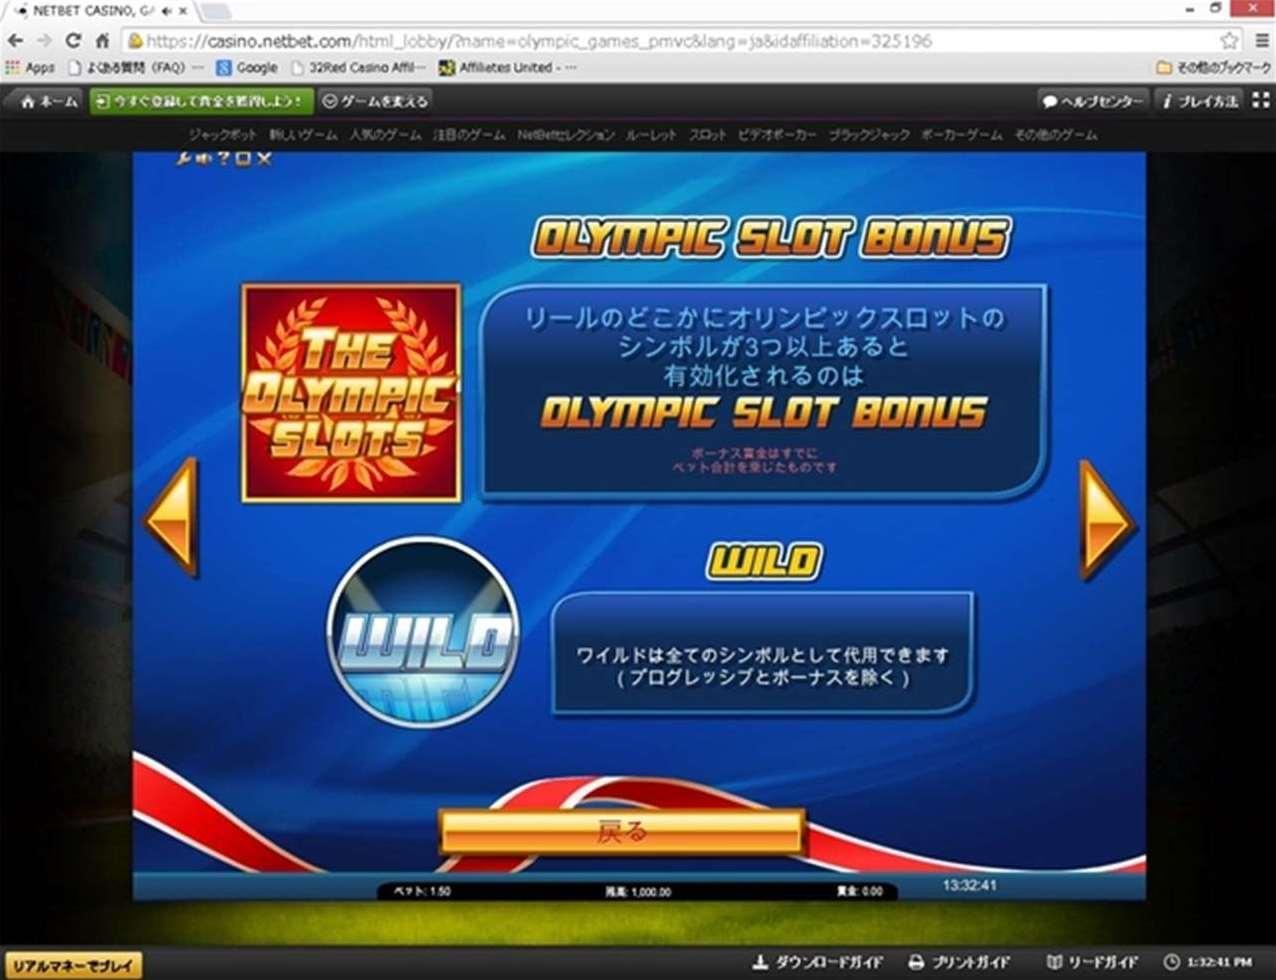 The Olympic Slotsボーナス1